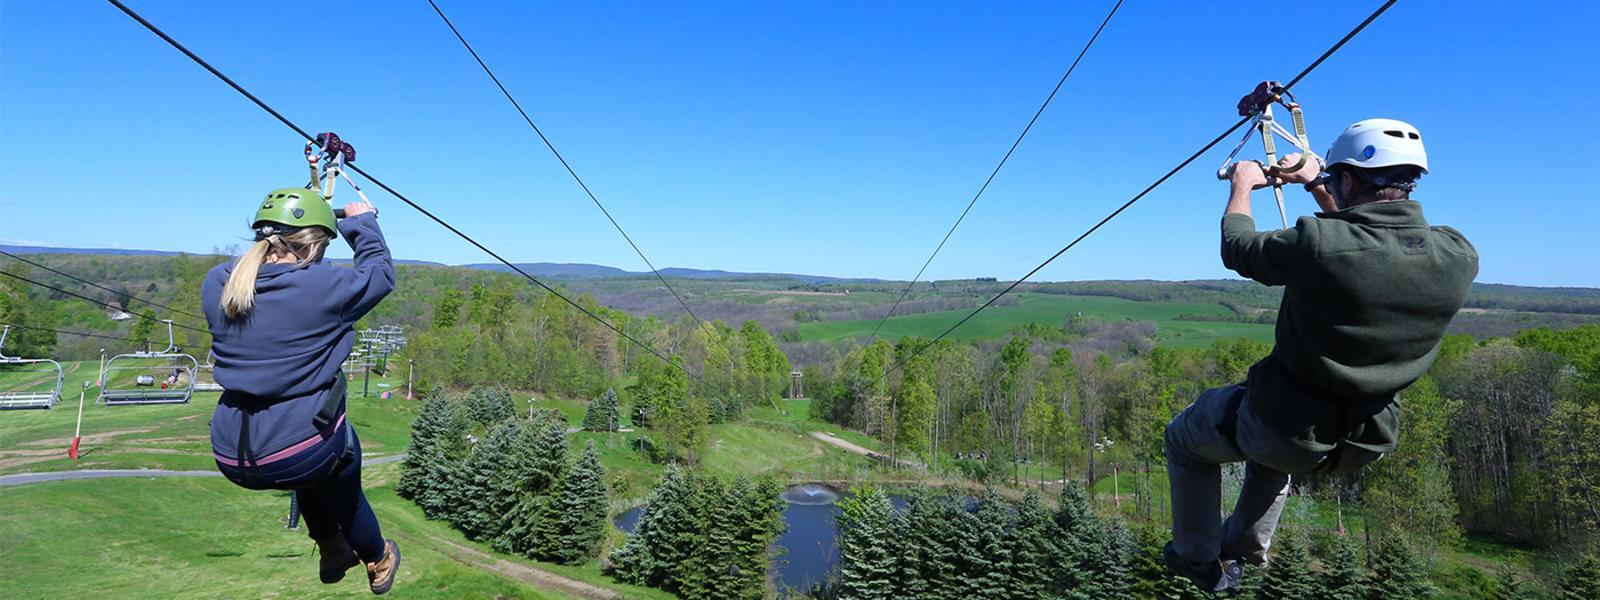 Seasonal Things To Do In Laurel Highlands Pa